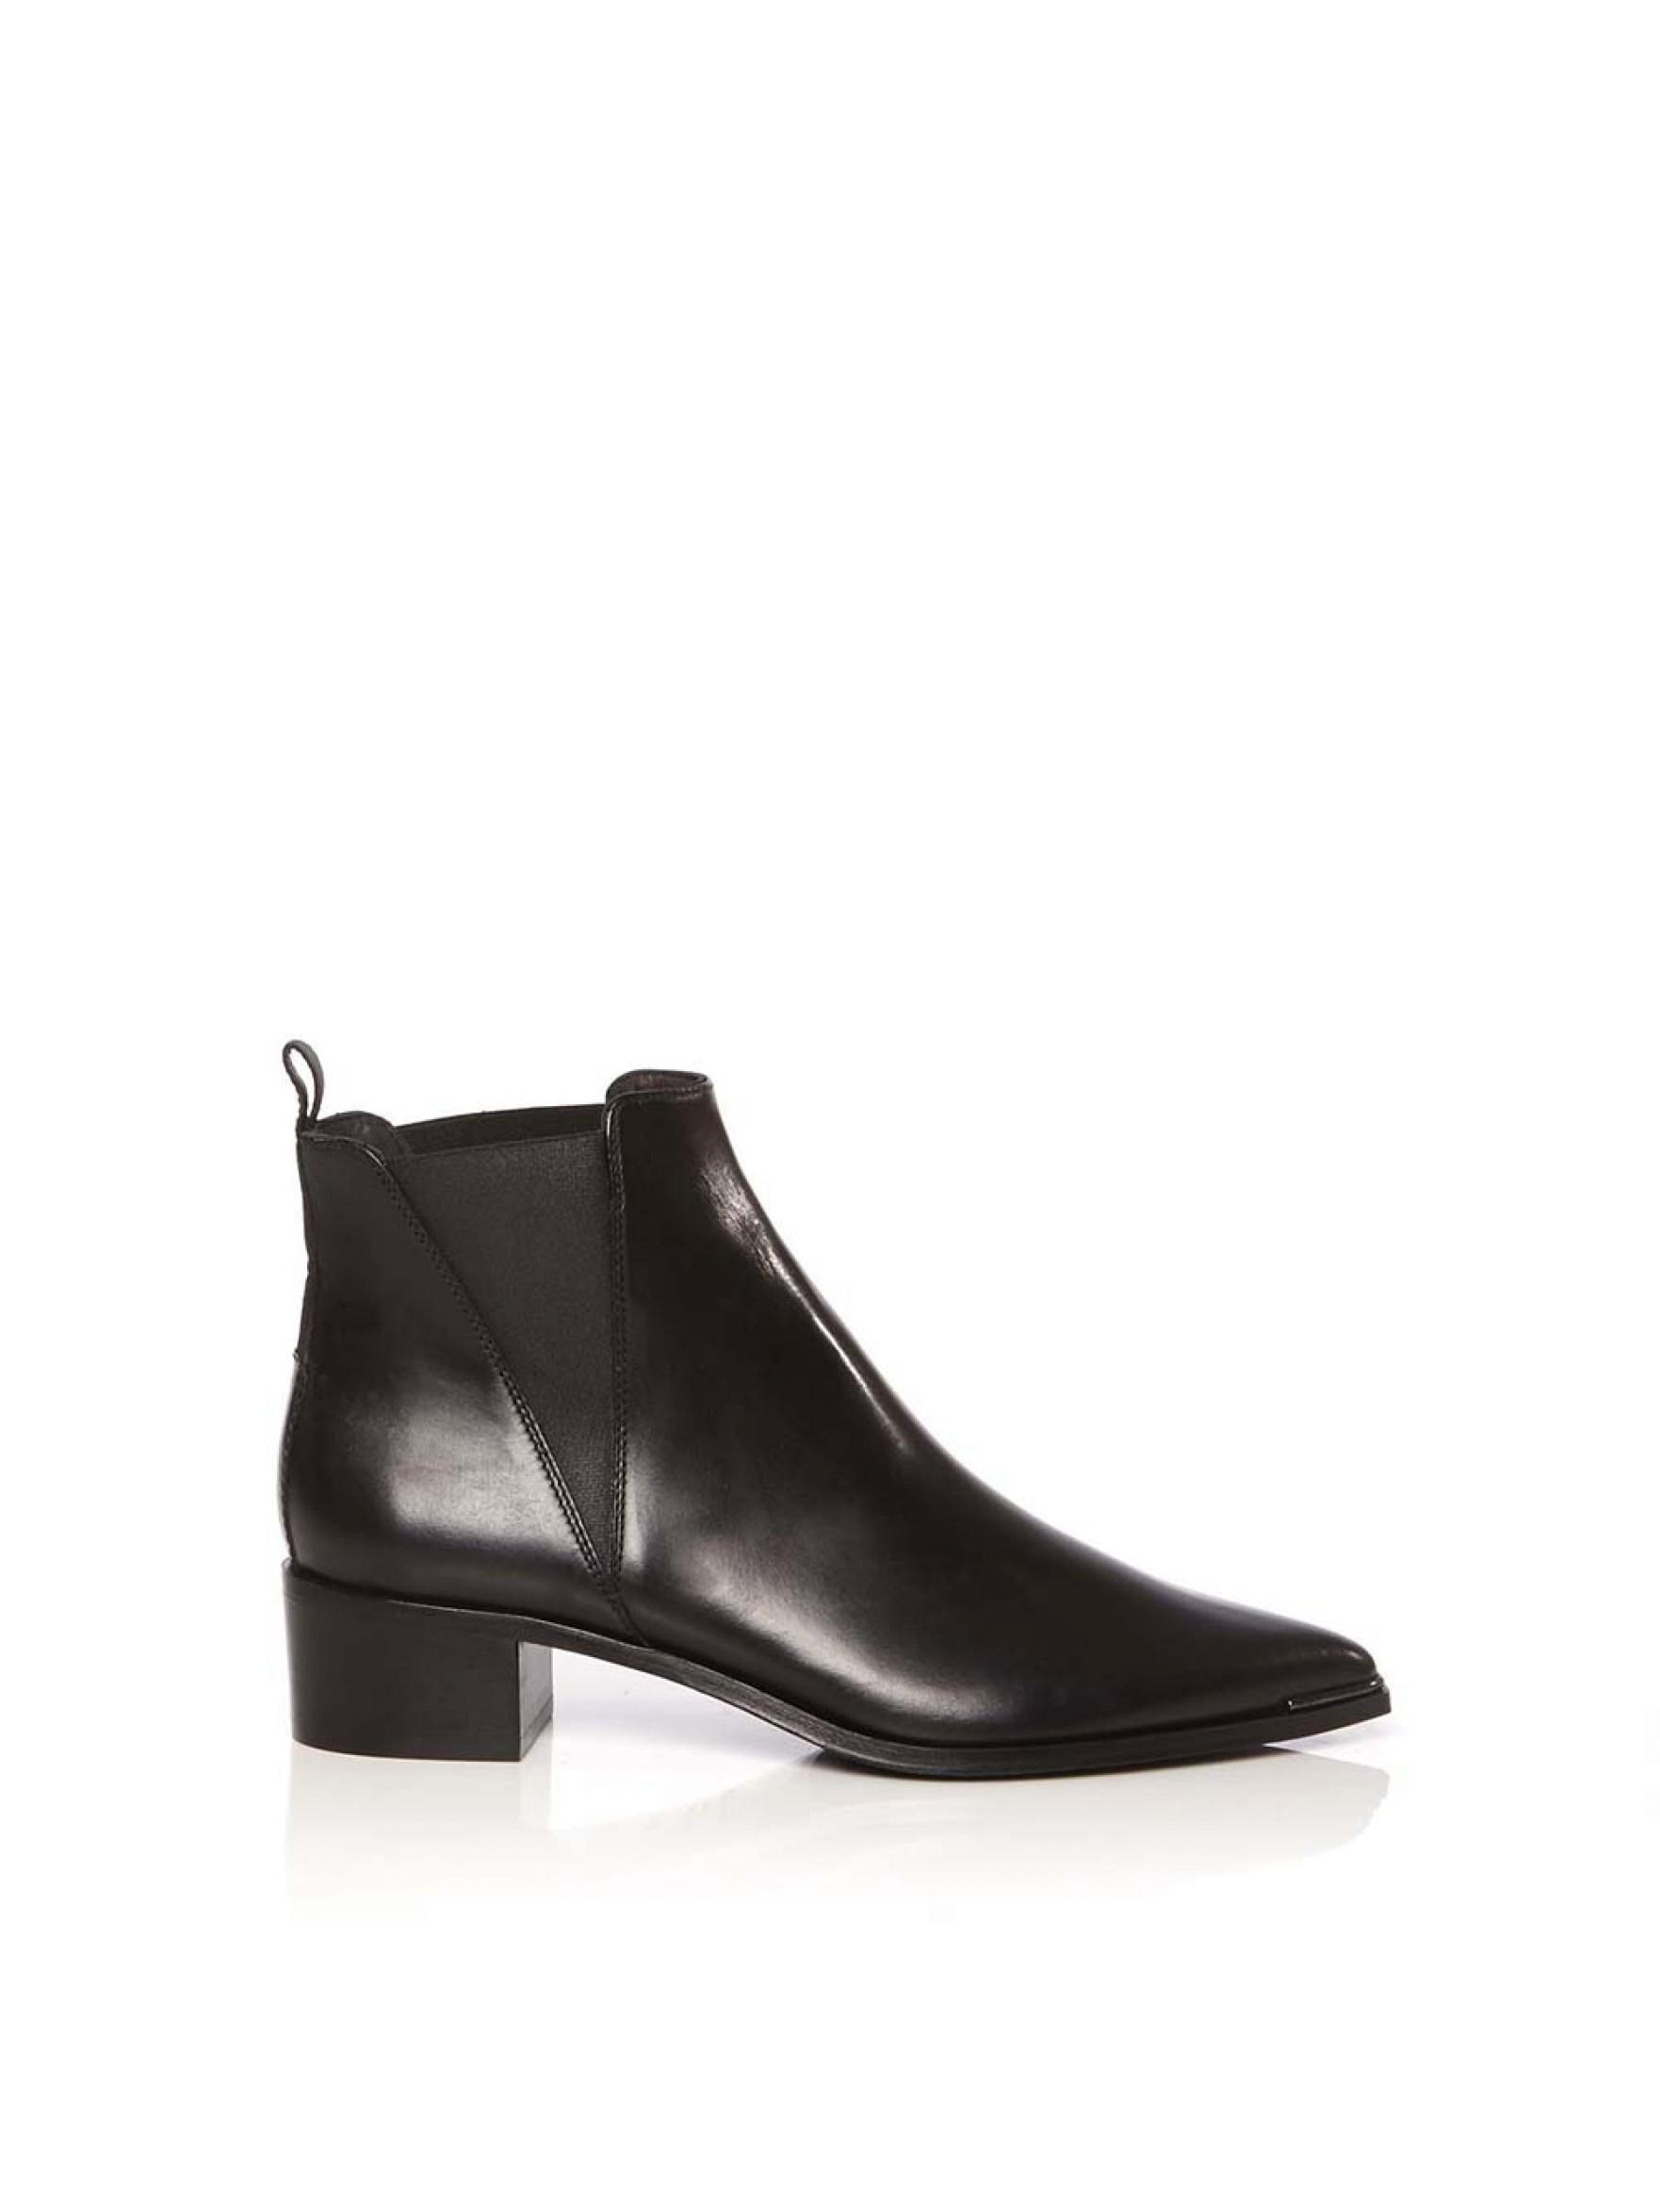 acne studios jensen calf boot in black lyst. Black Bedroom Furniture Sets. Home Design Ideas